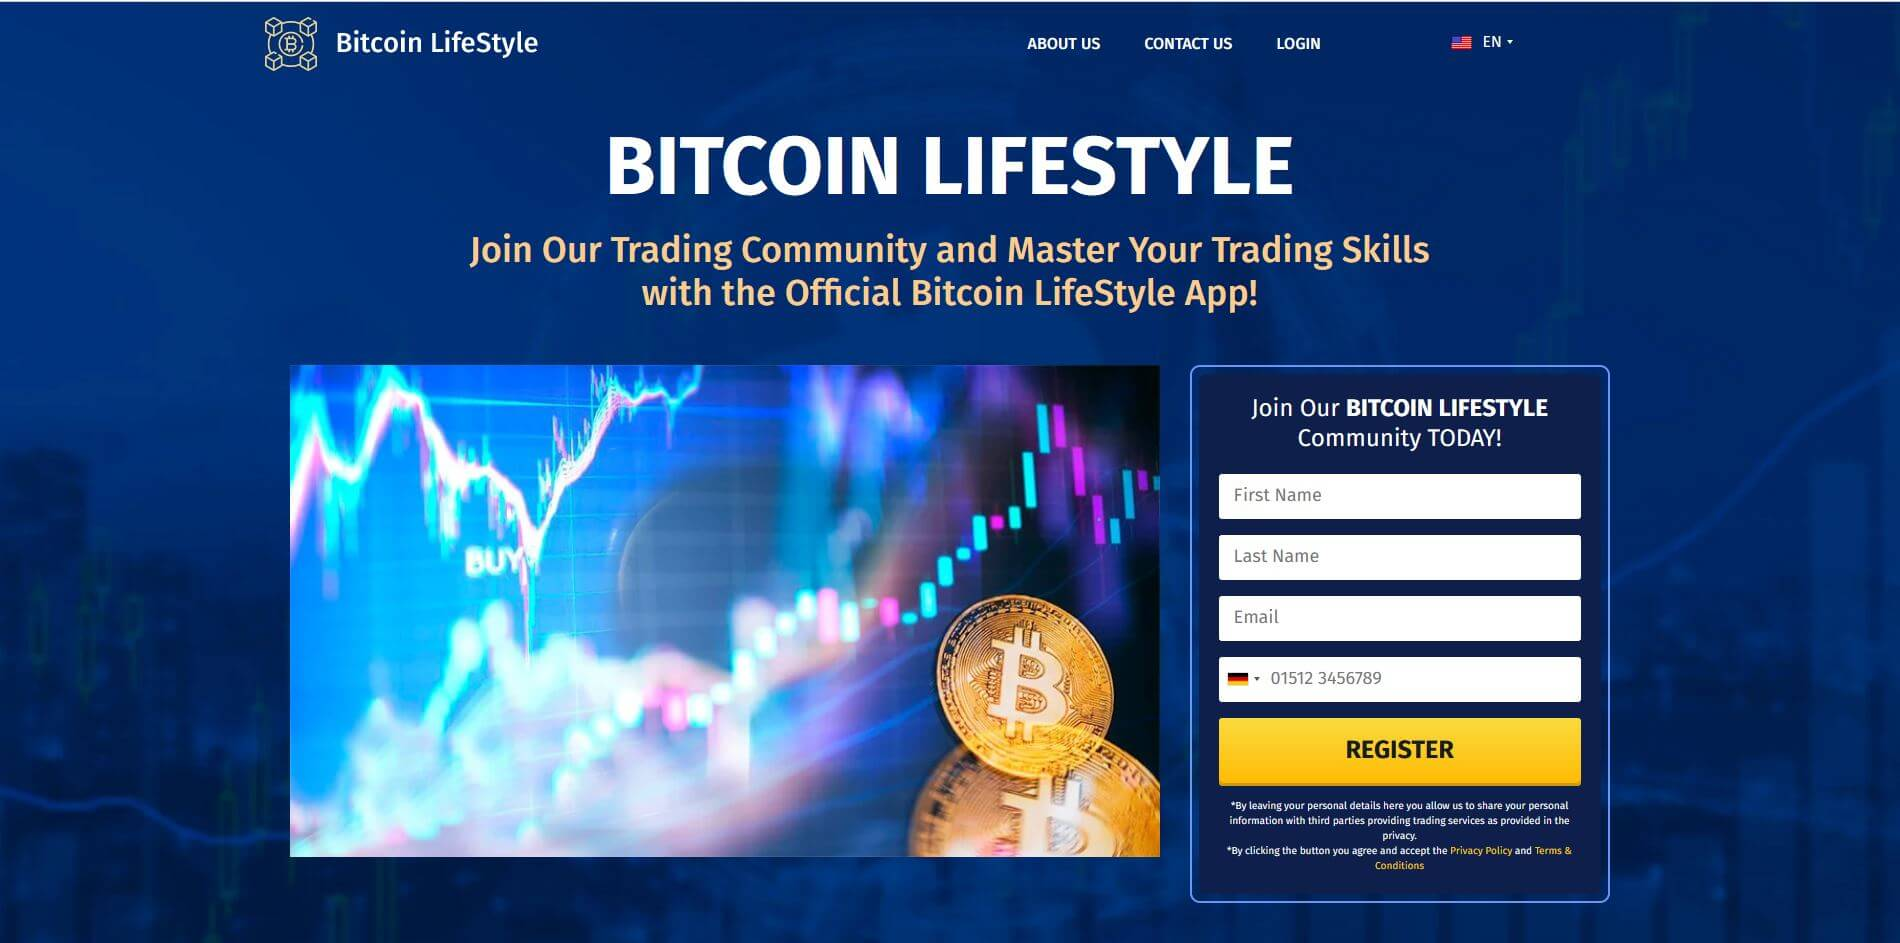 Bitcoin Lifestyle – Truffa o legittimo? I RISULTATI RIVELATI